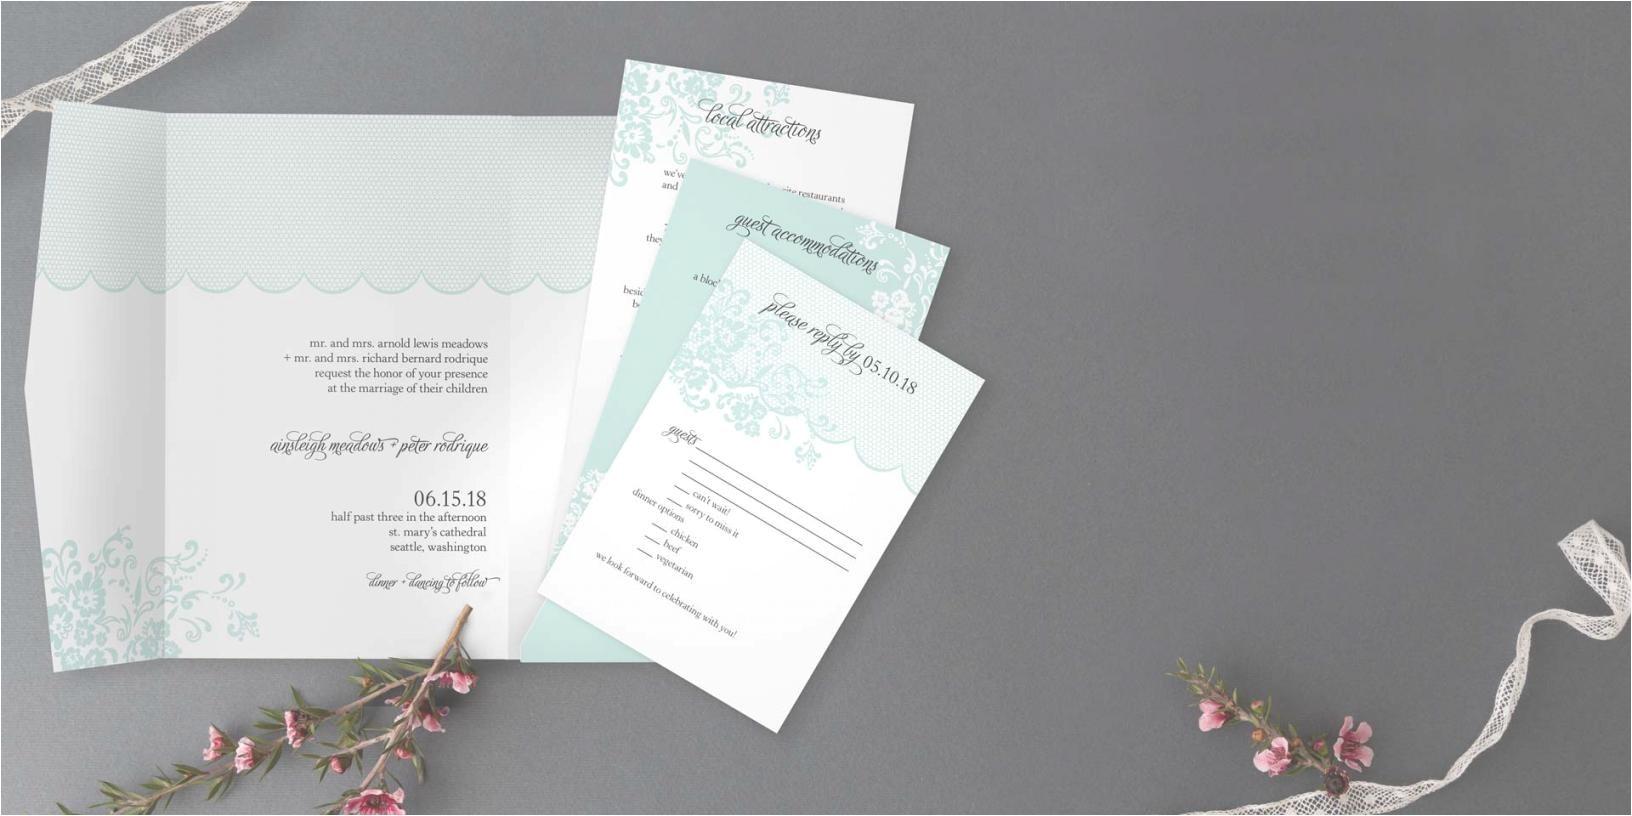 easy diy wedding invitations chica and jo within flip book wedding invitation